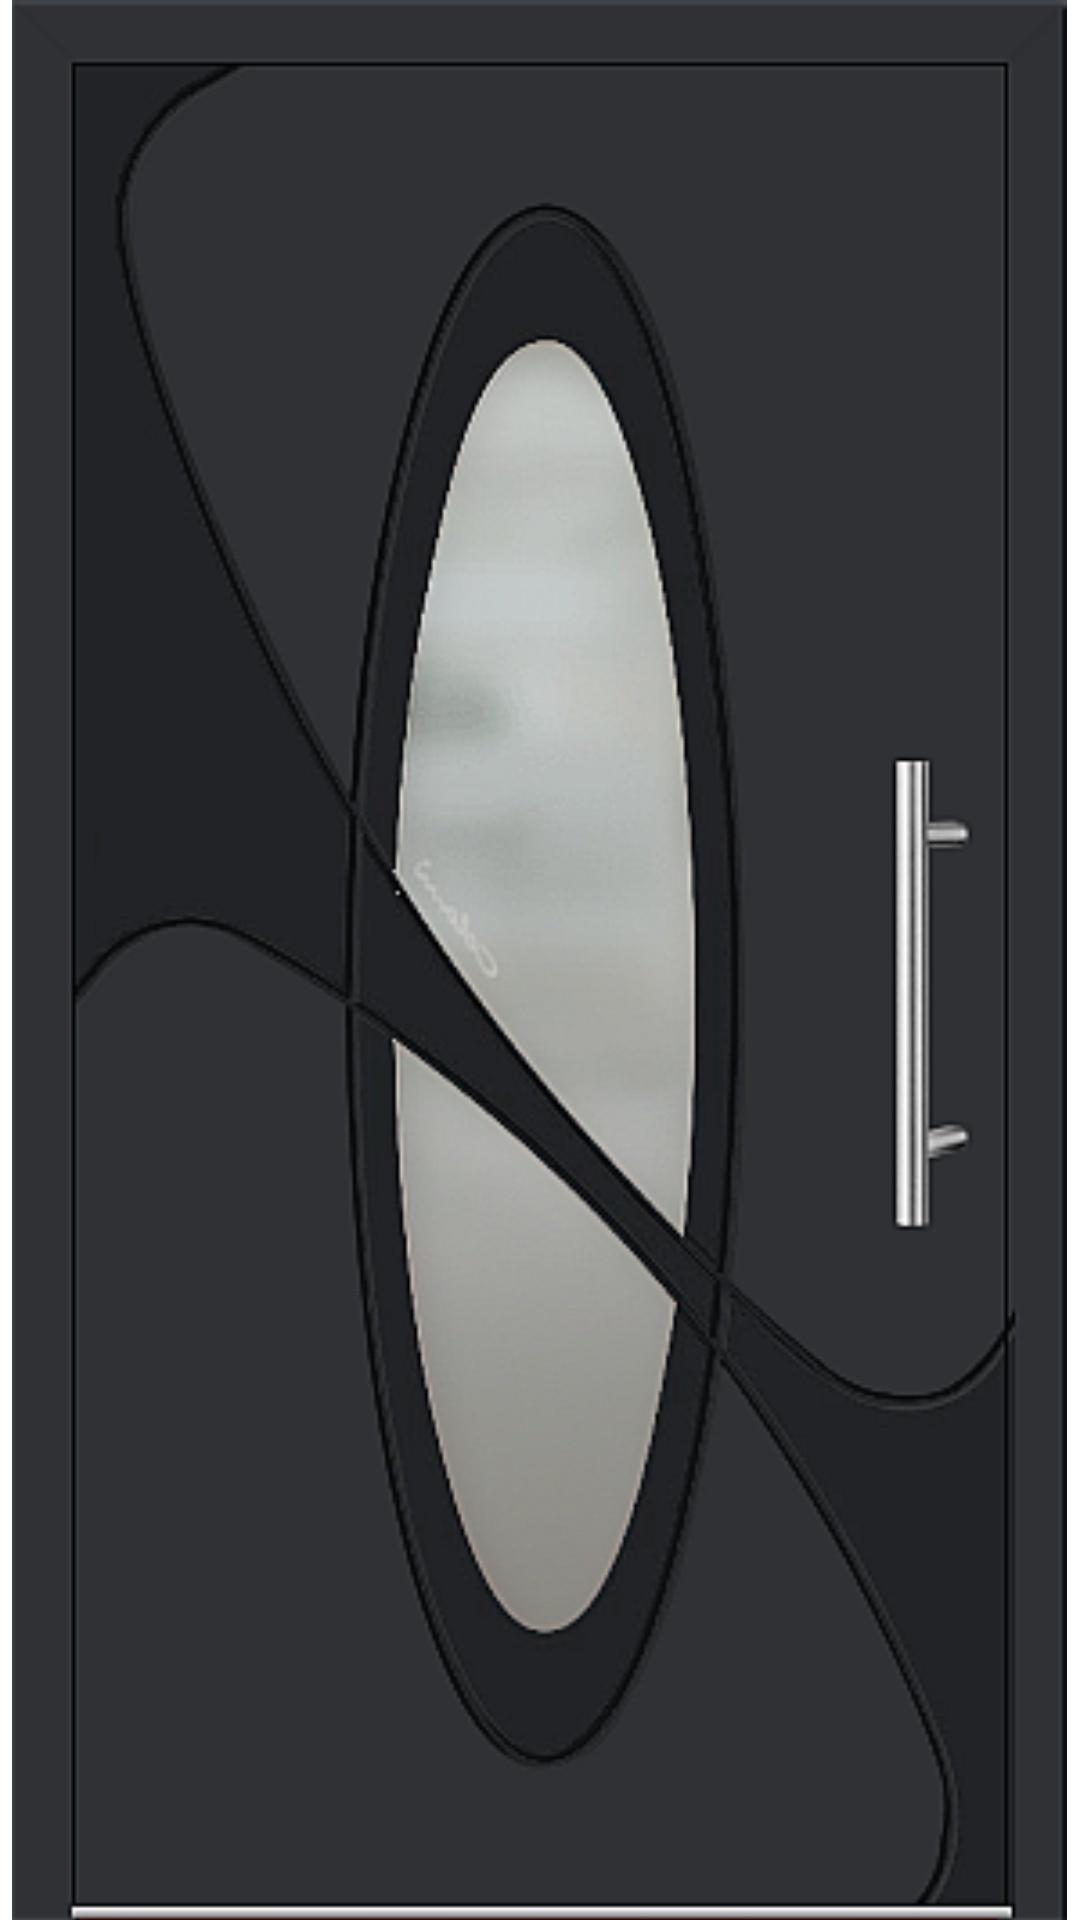 Aluminium Haustür Modell 6990-41 schwarz